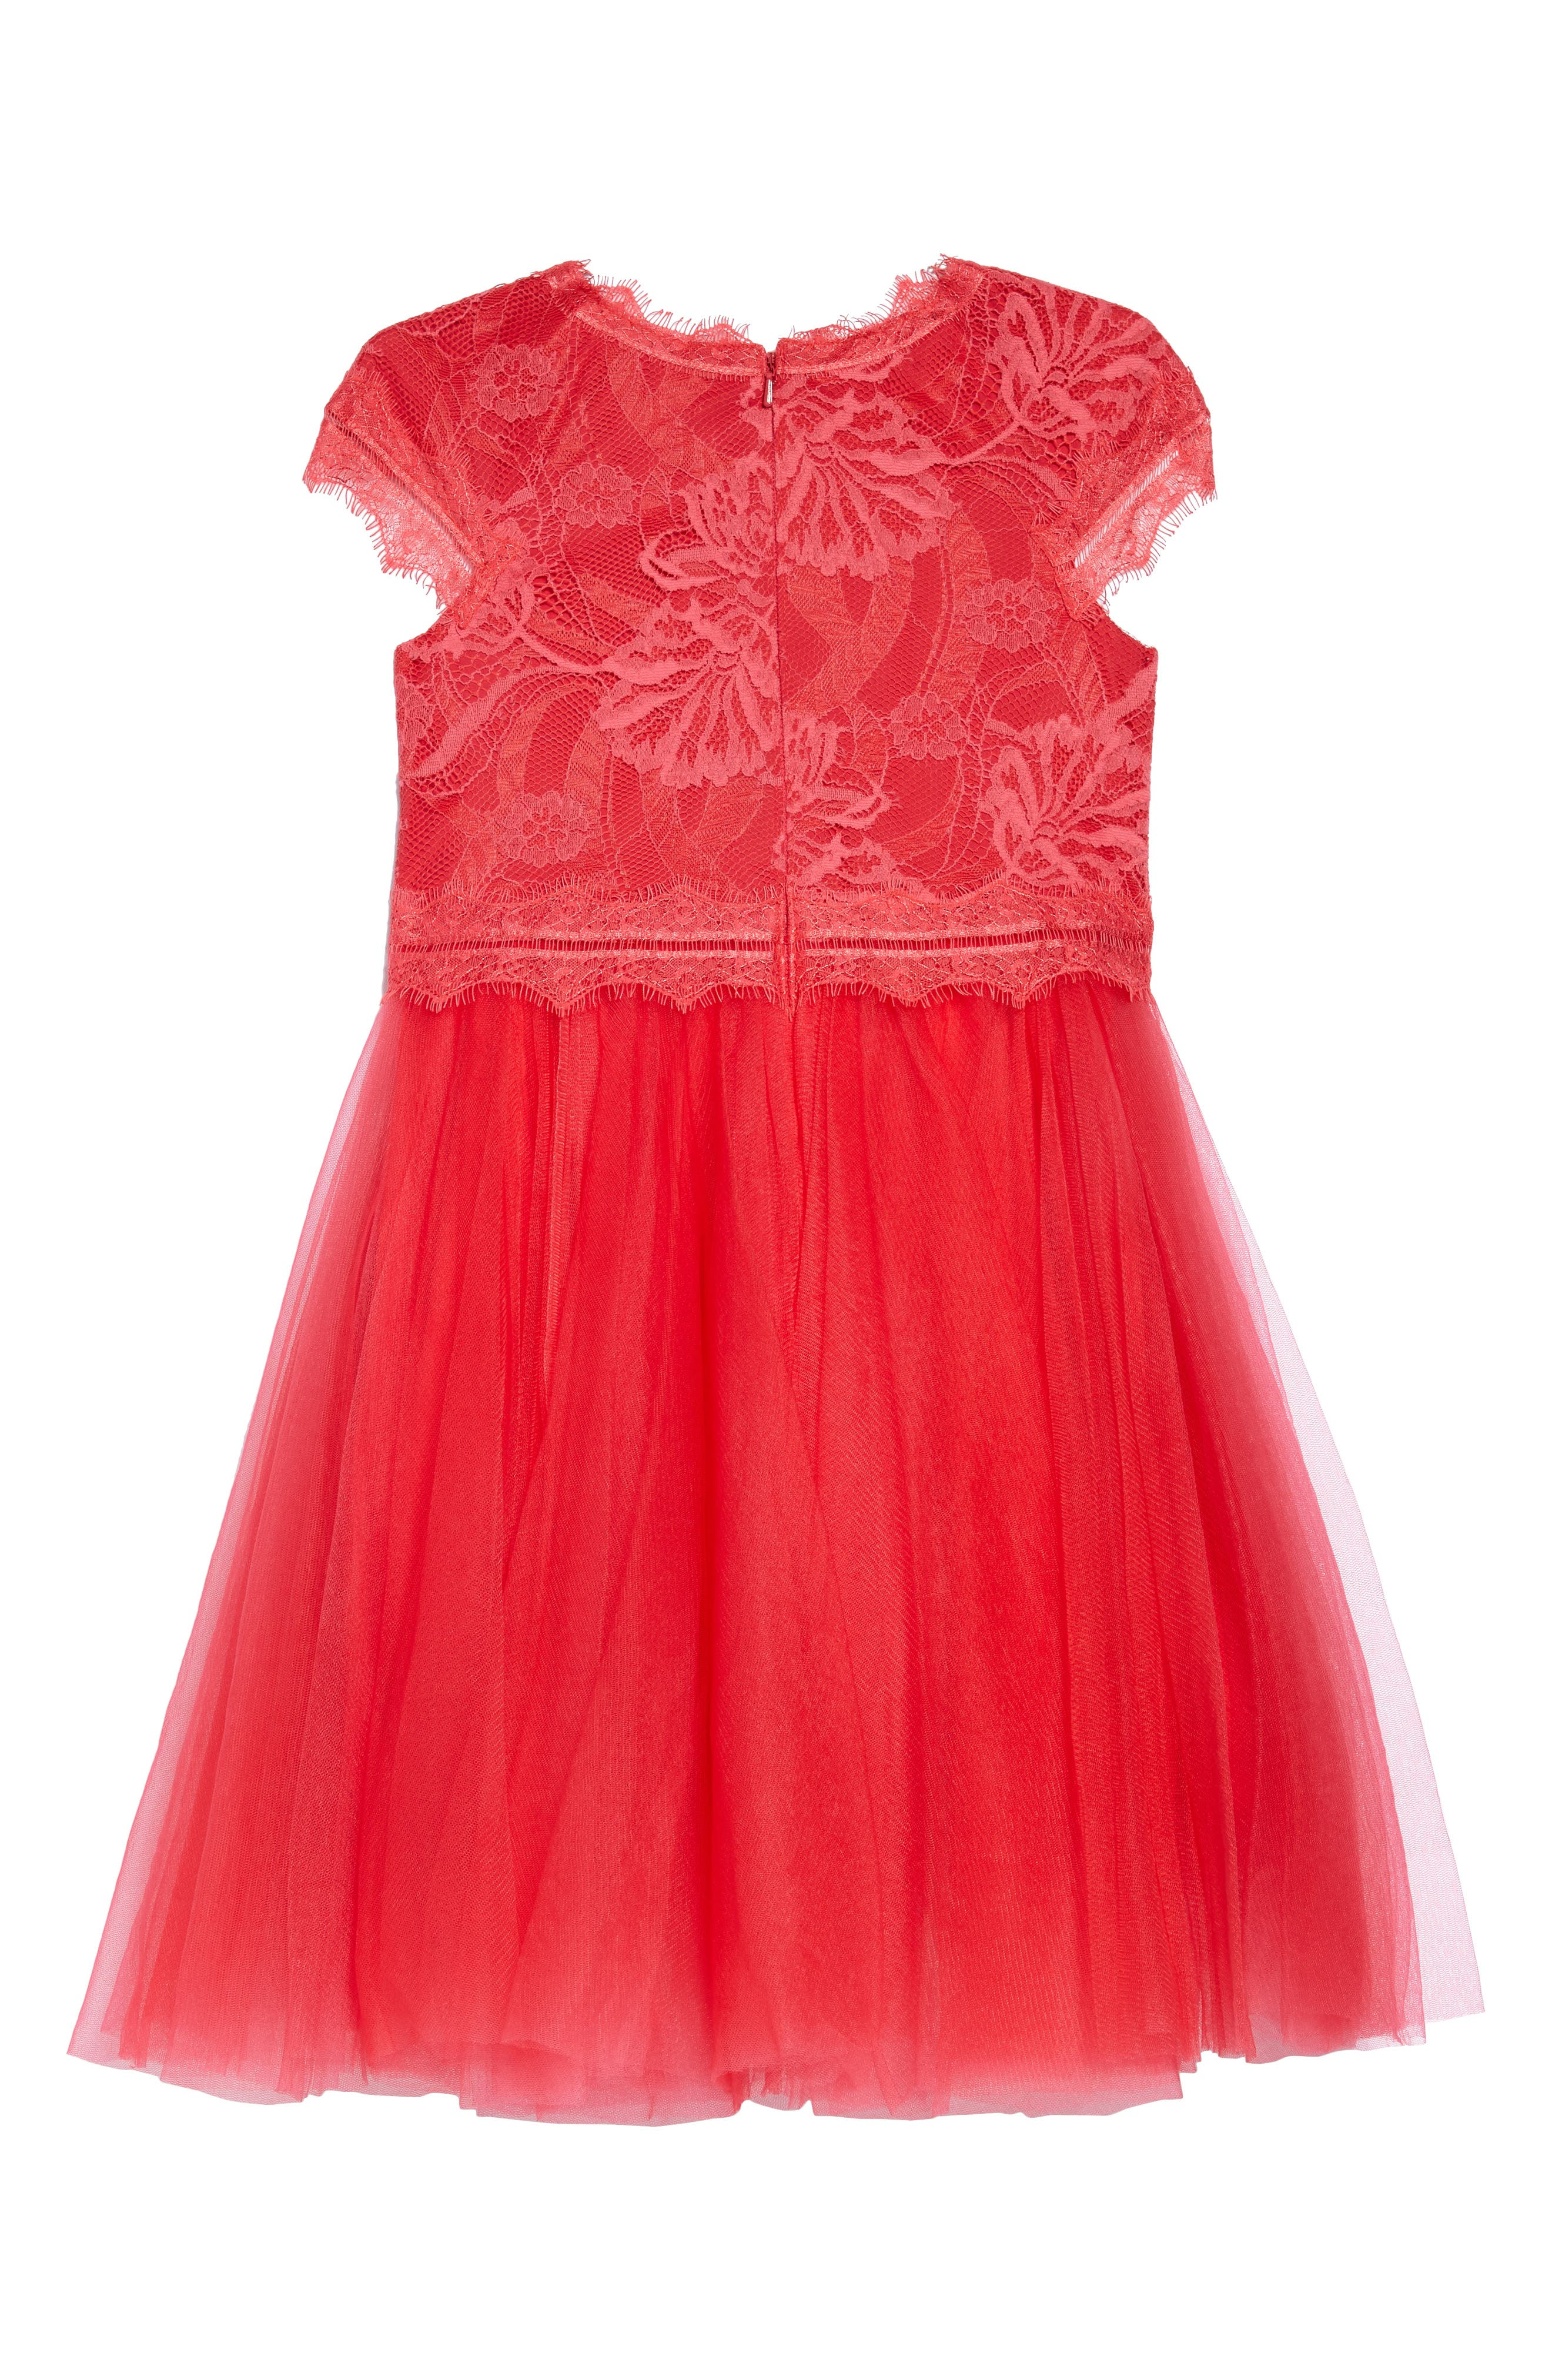 Floral Lace Tulle Dress,                             Alternate thumbnail 2, color,